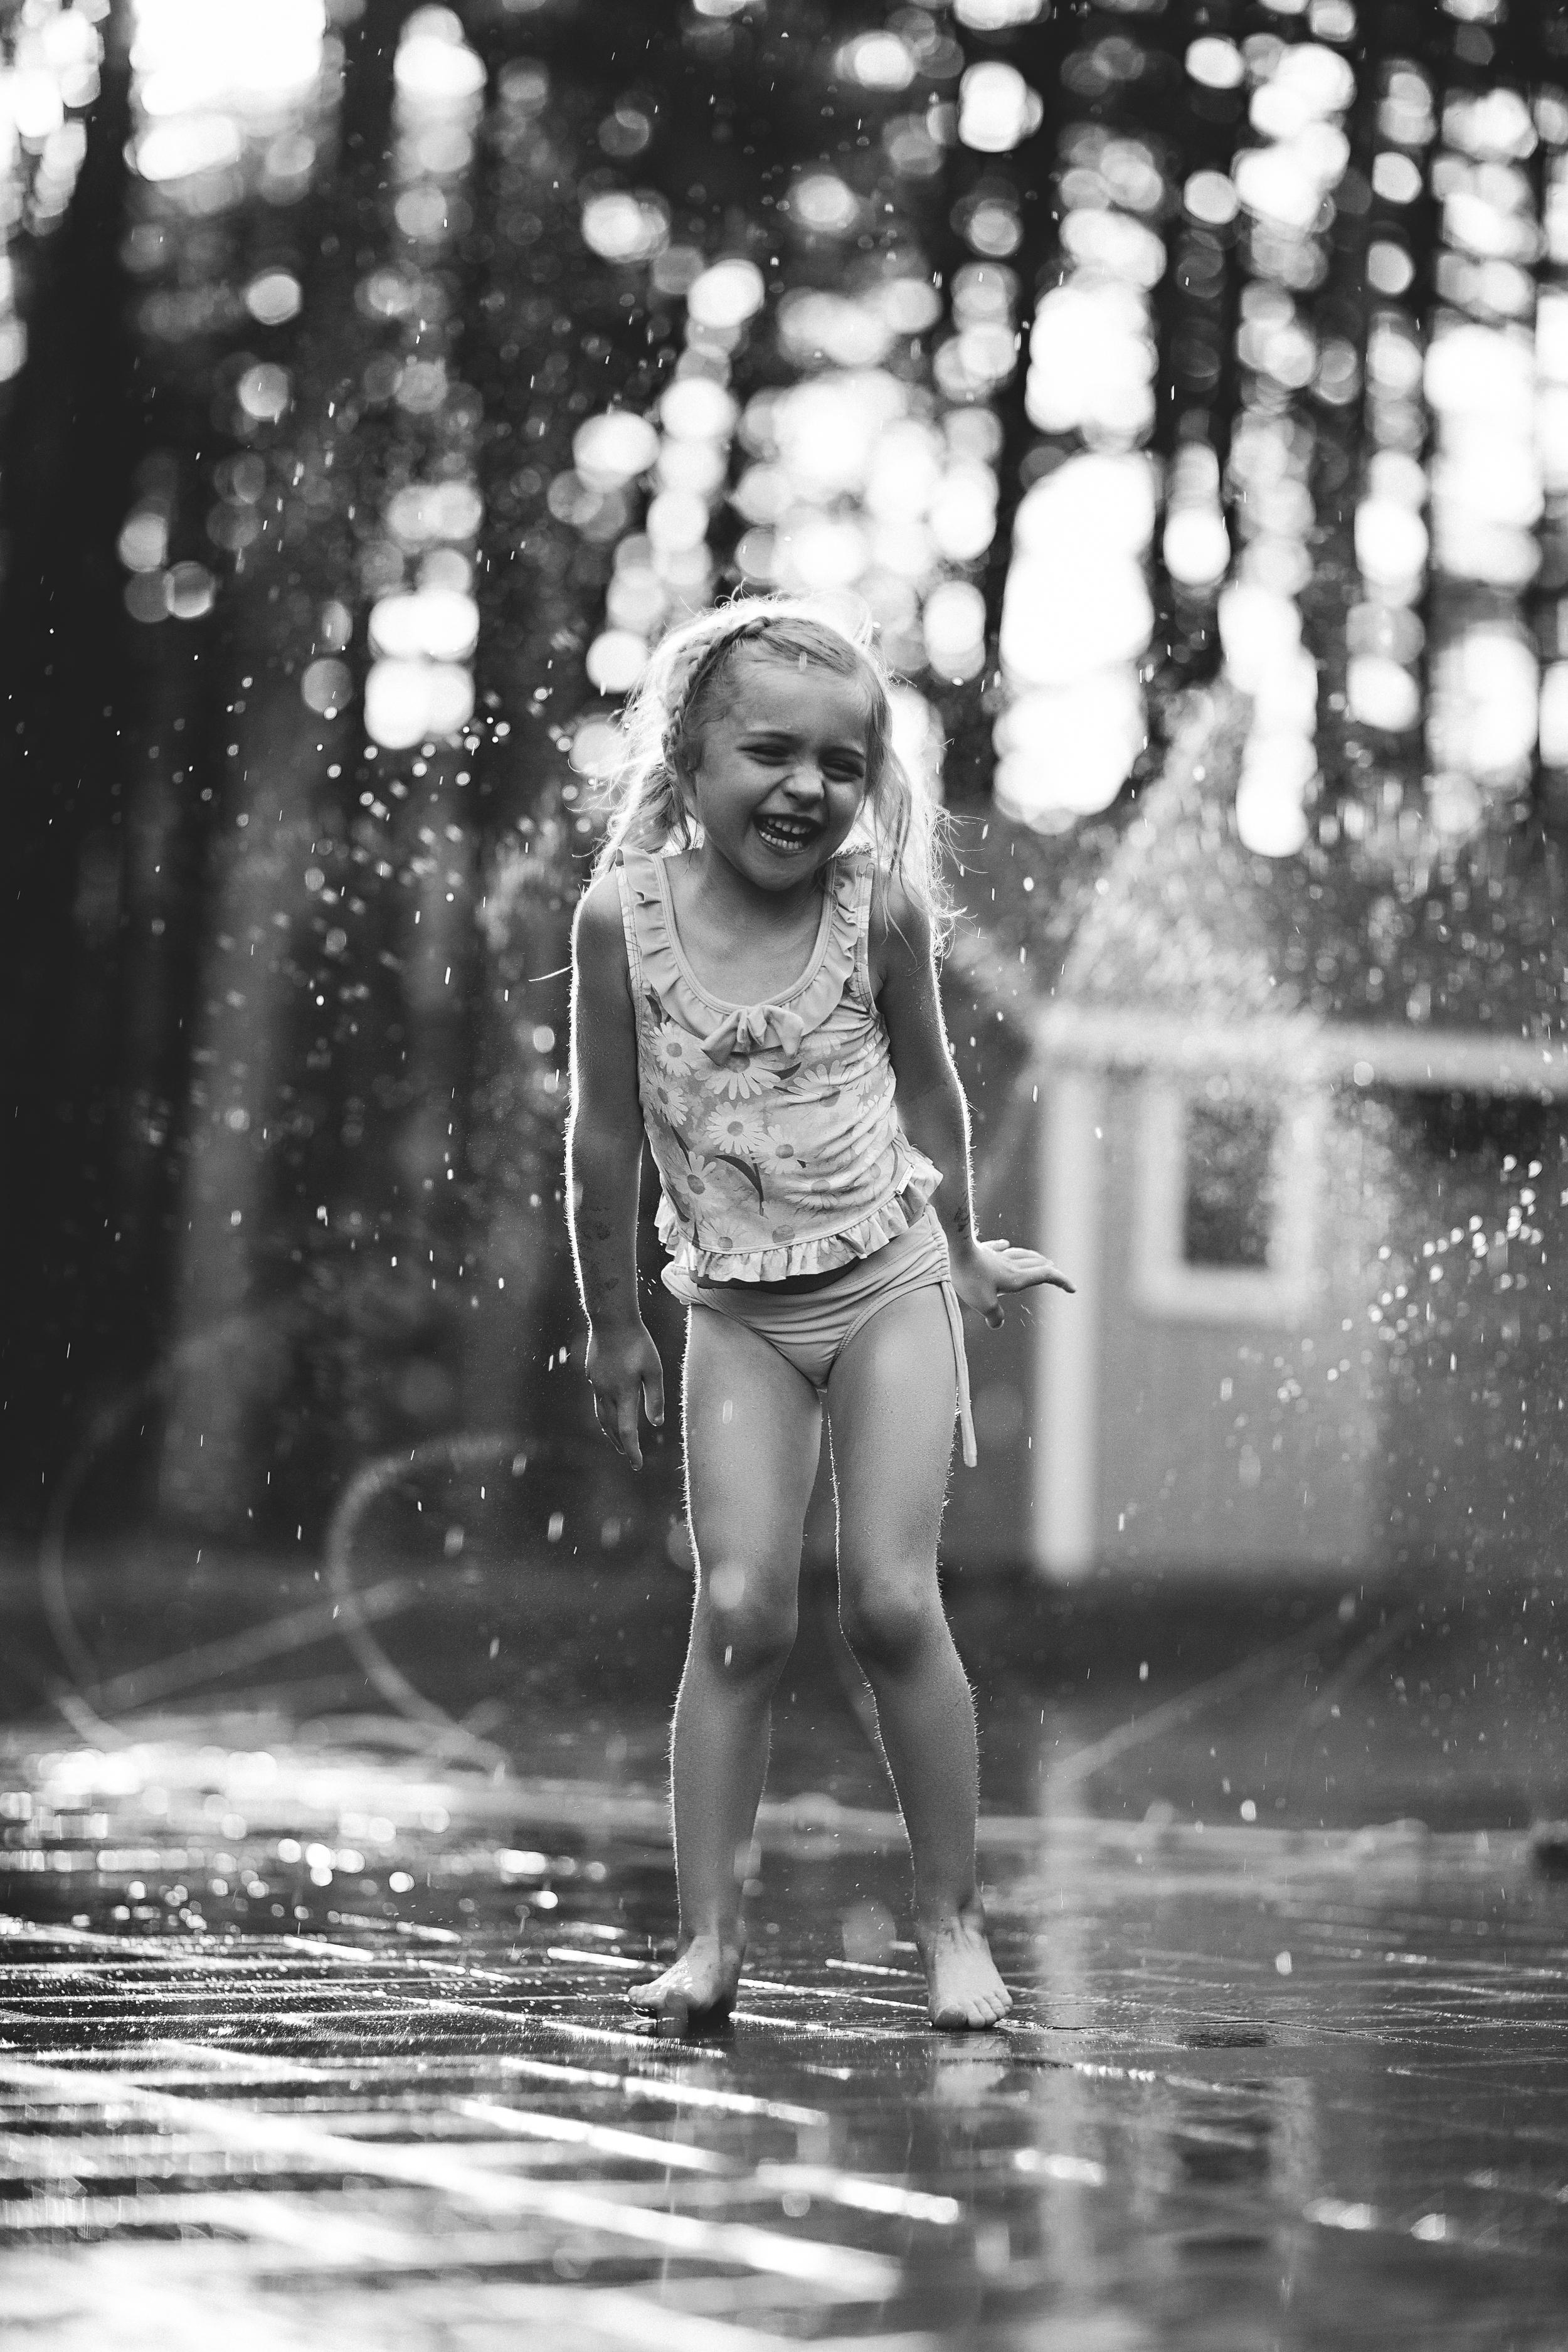 hello-olivia-photography-long-island-family-child-kids-lifestyle-portrait-photographer-dancing-sprinkler-toddler-girl